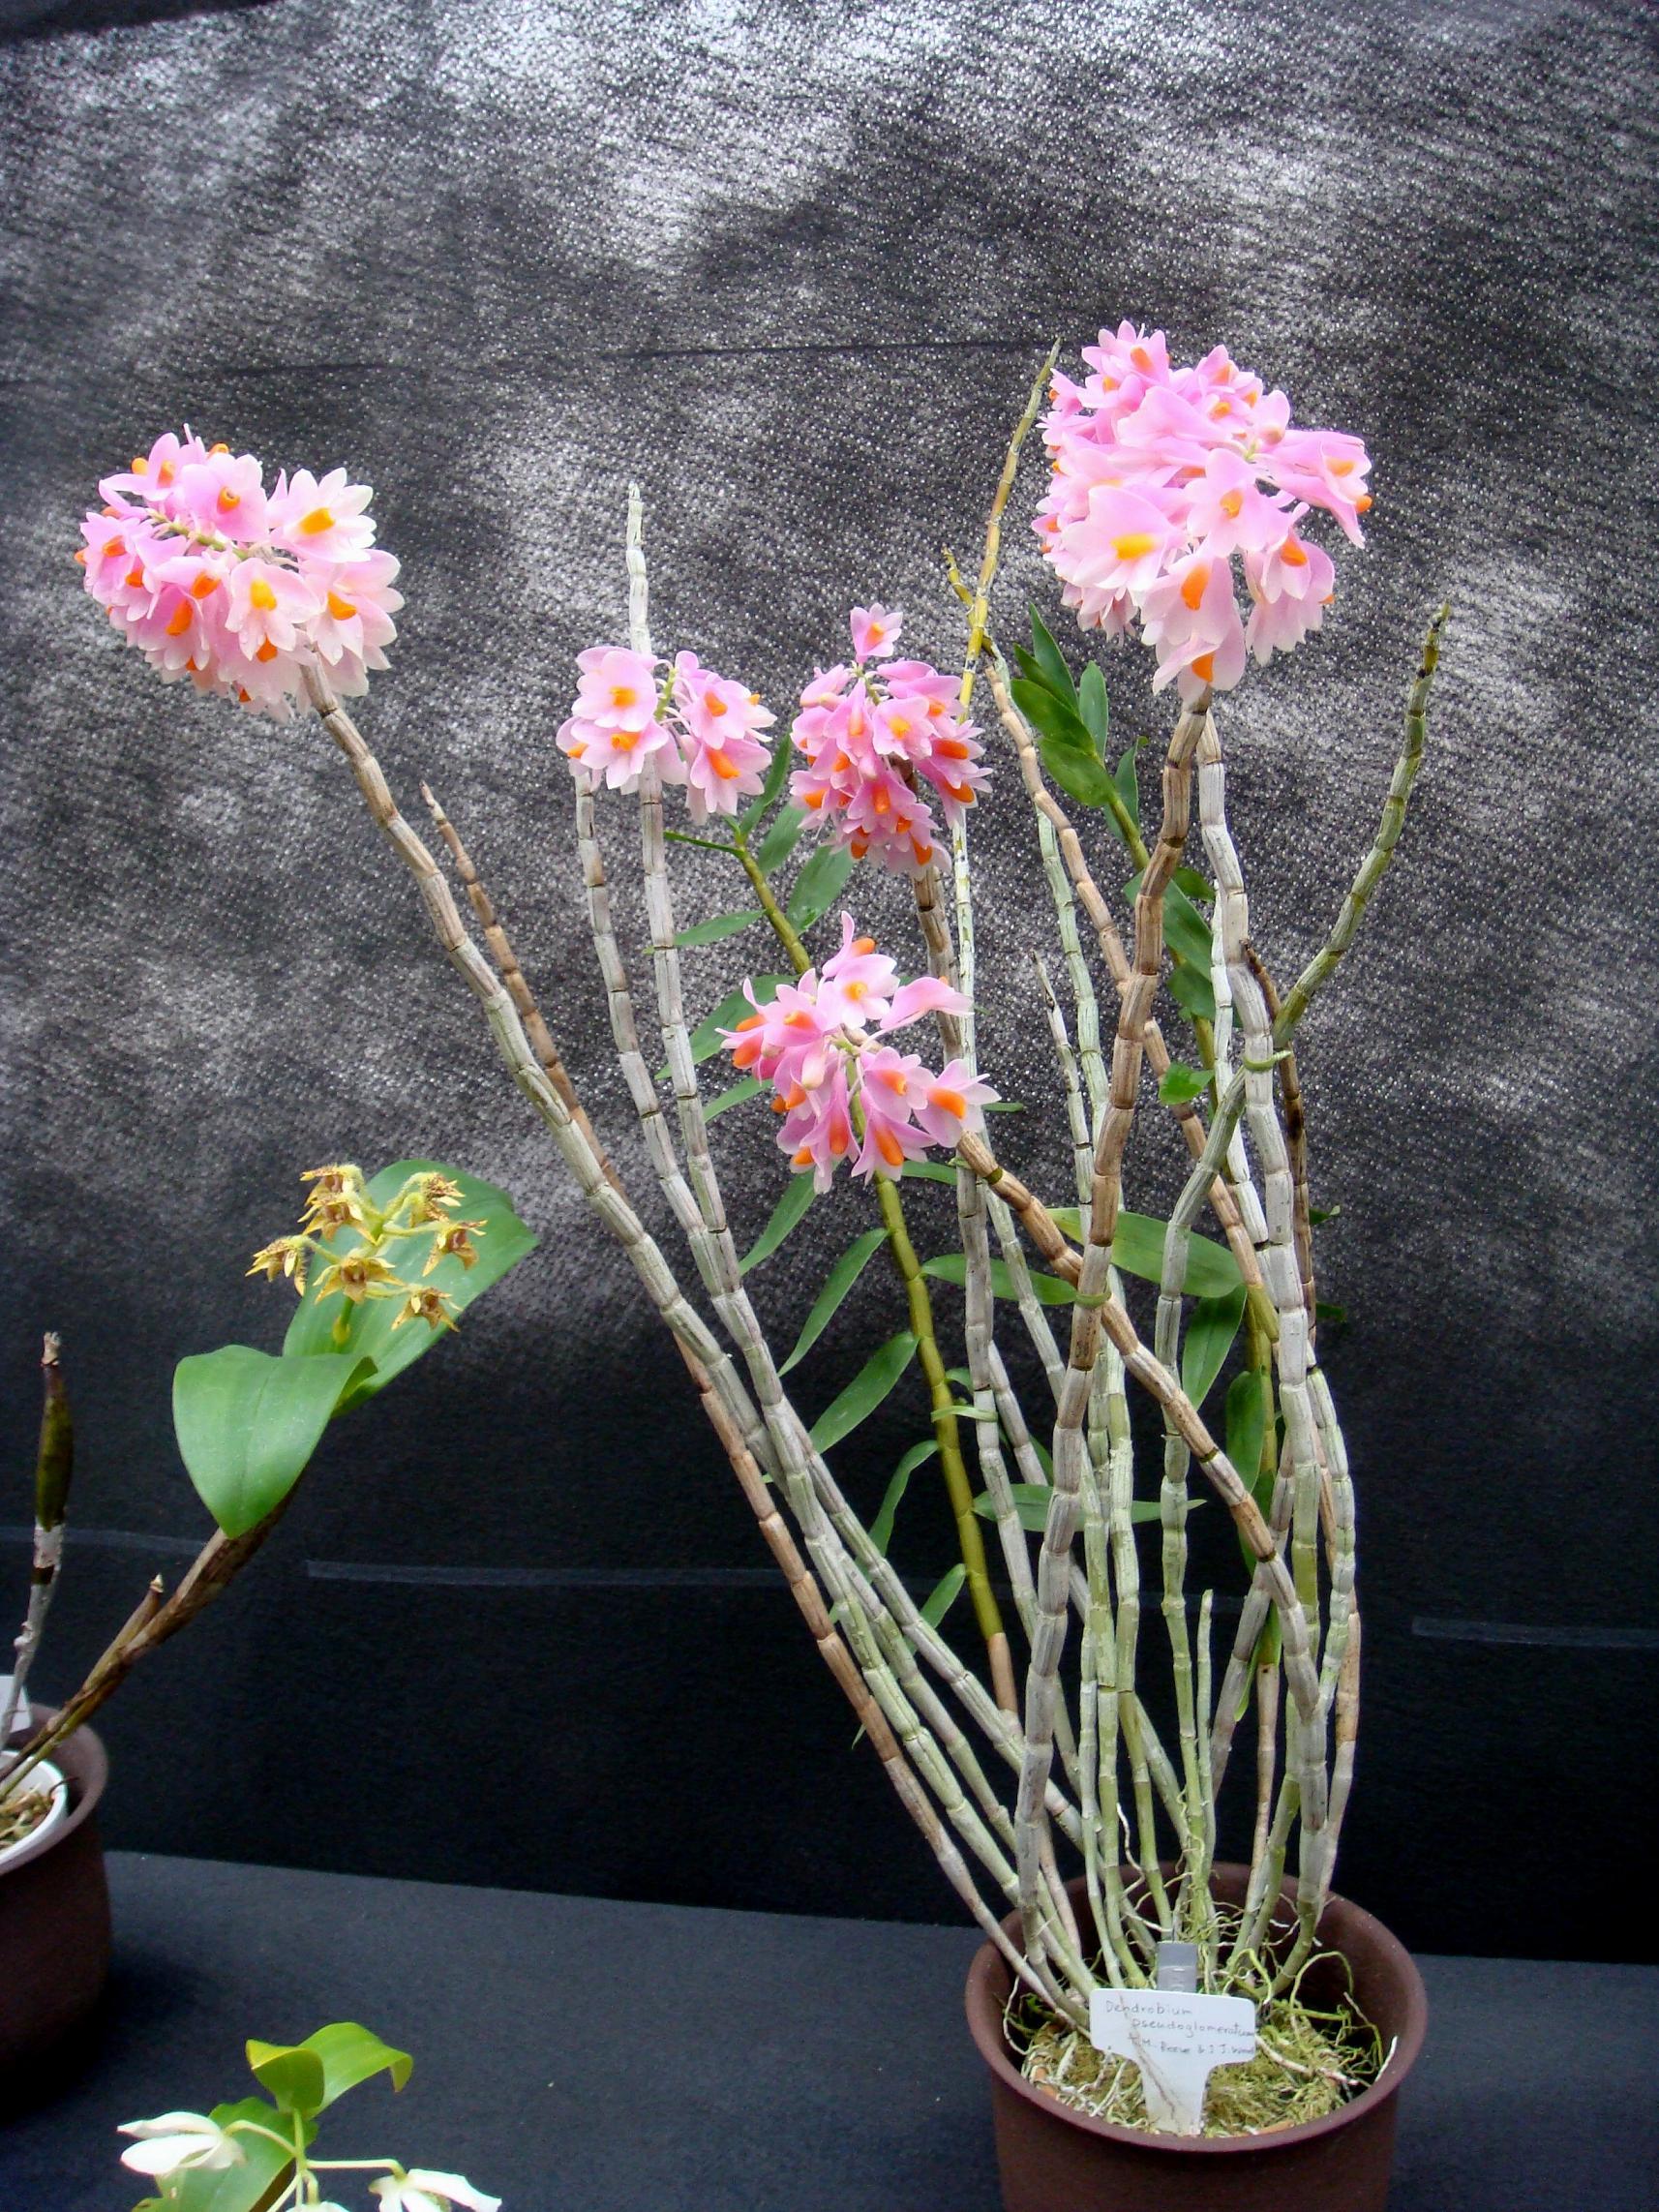 http://orchids.la.coocan.jp/Dendrobium/Dendrobium%20psuedoglomeratum/DSC03199.JPG